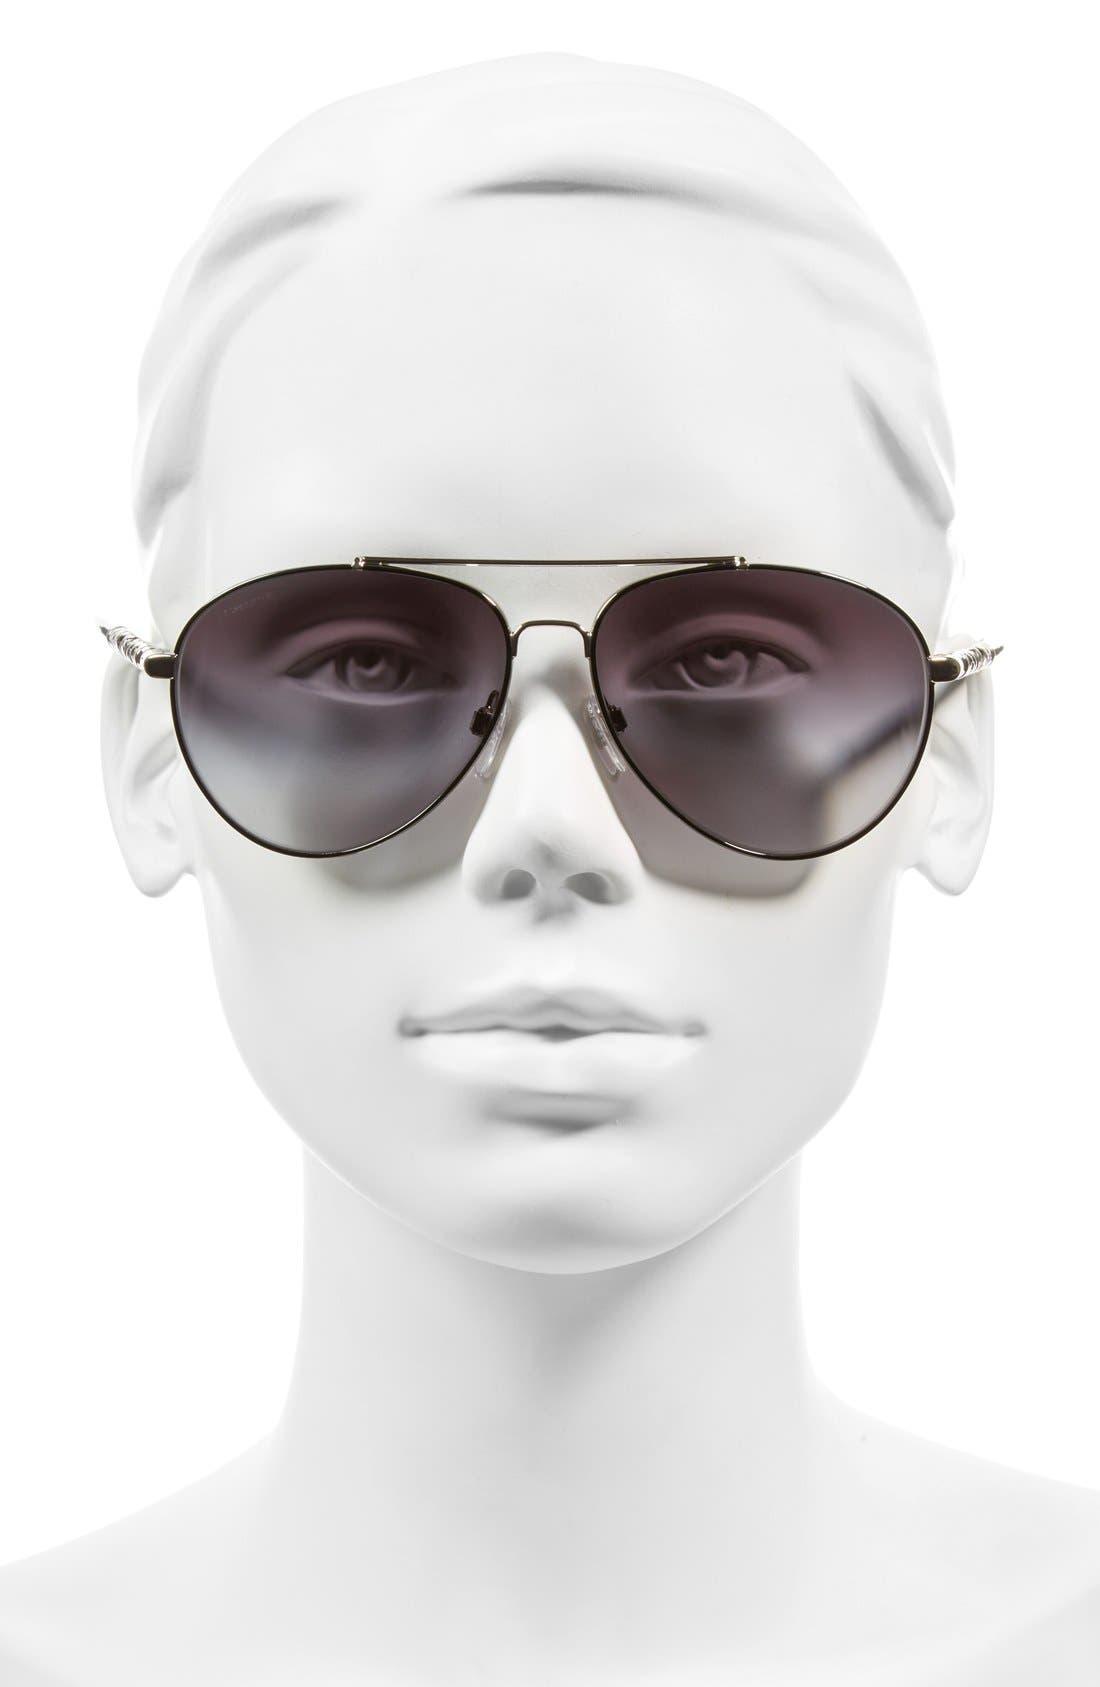 58mm Aviator Sunglasses,                             Alternate thumbnail 2, color,                             020